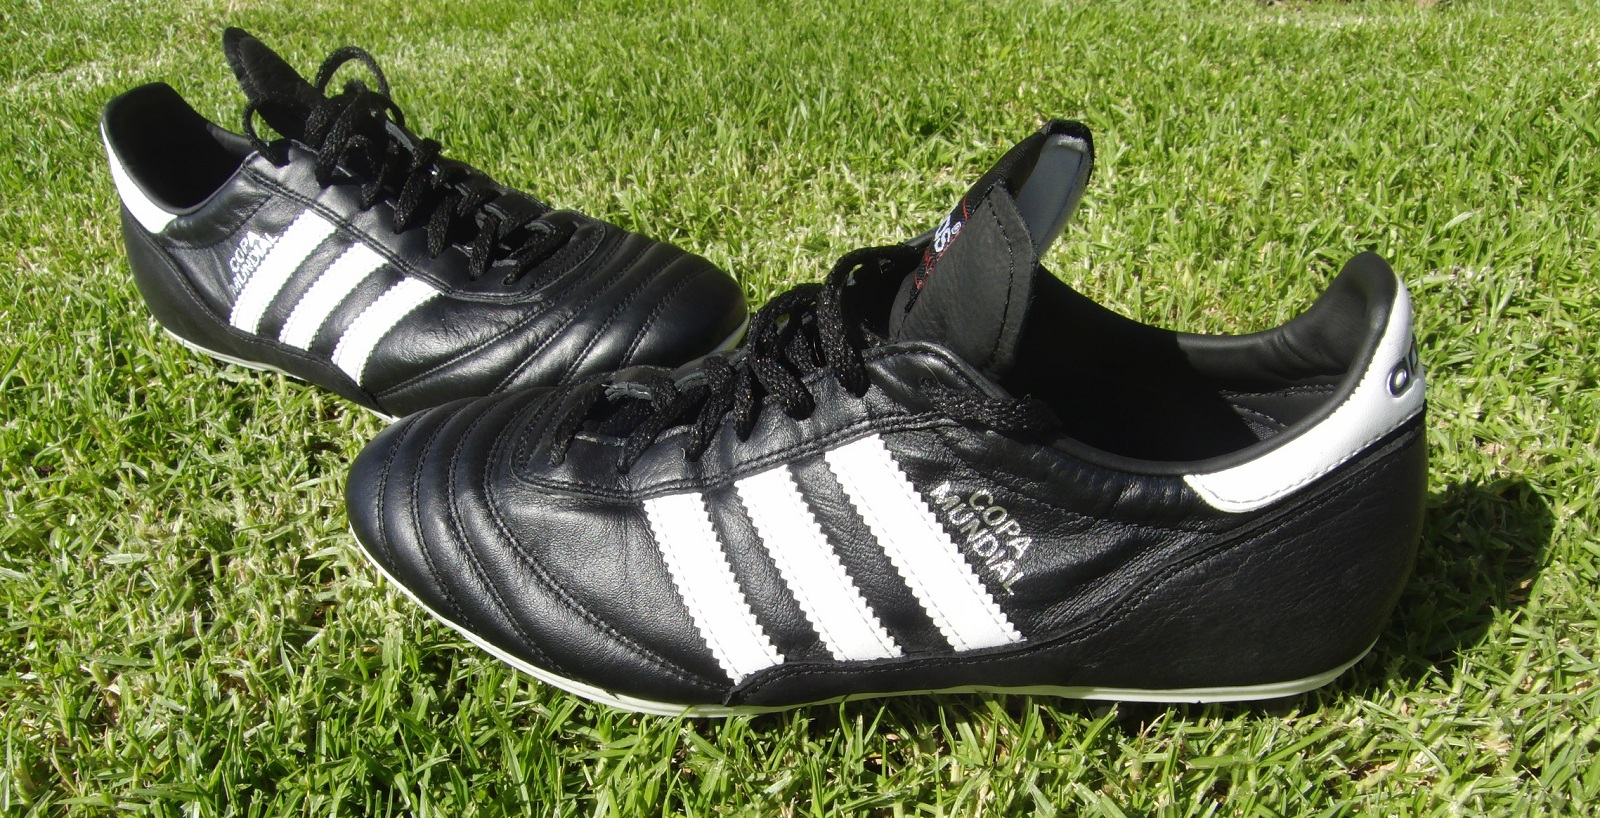 Adidas Copa Mundial Review | Soccer